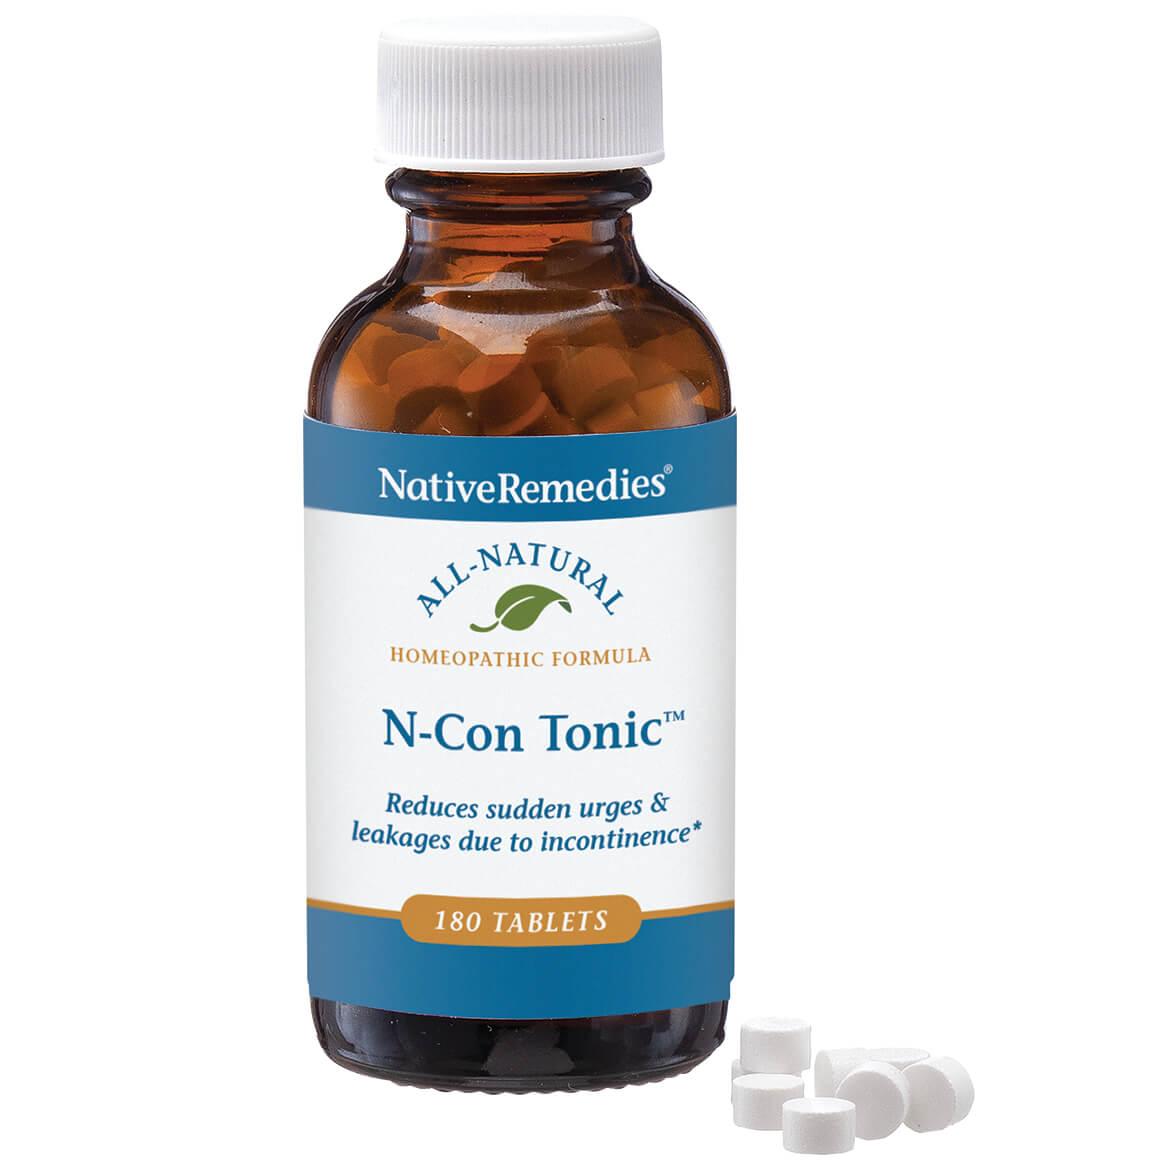 NativeRemedies® N-Con Tonic™-351041